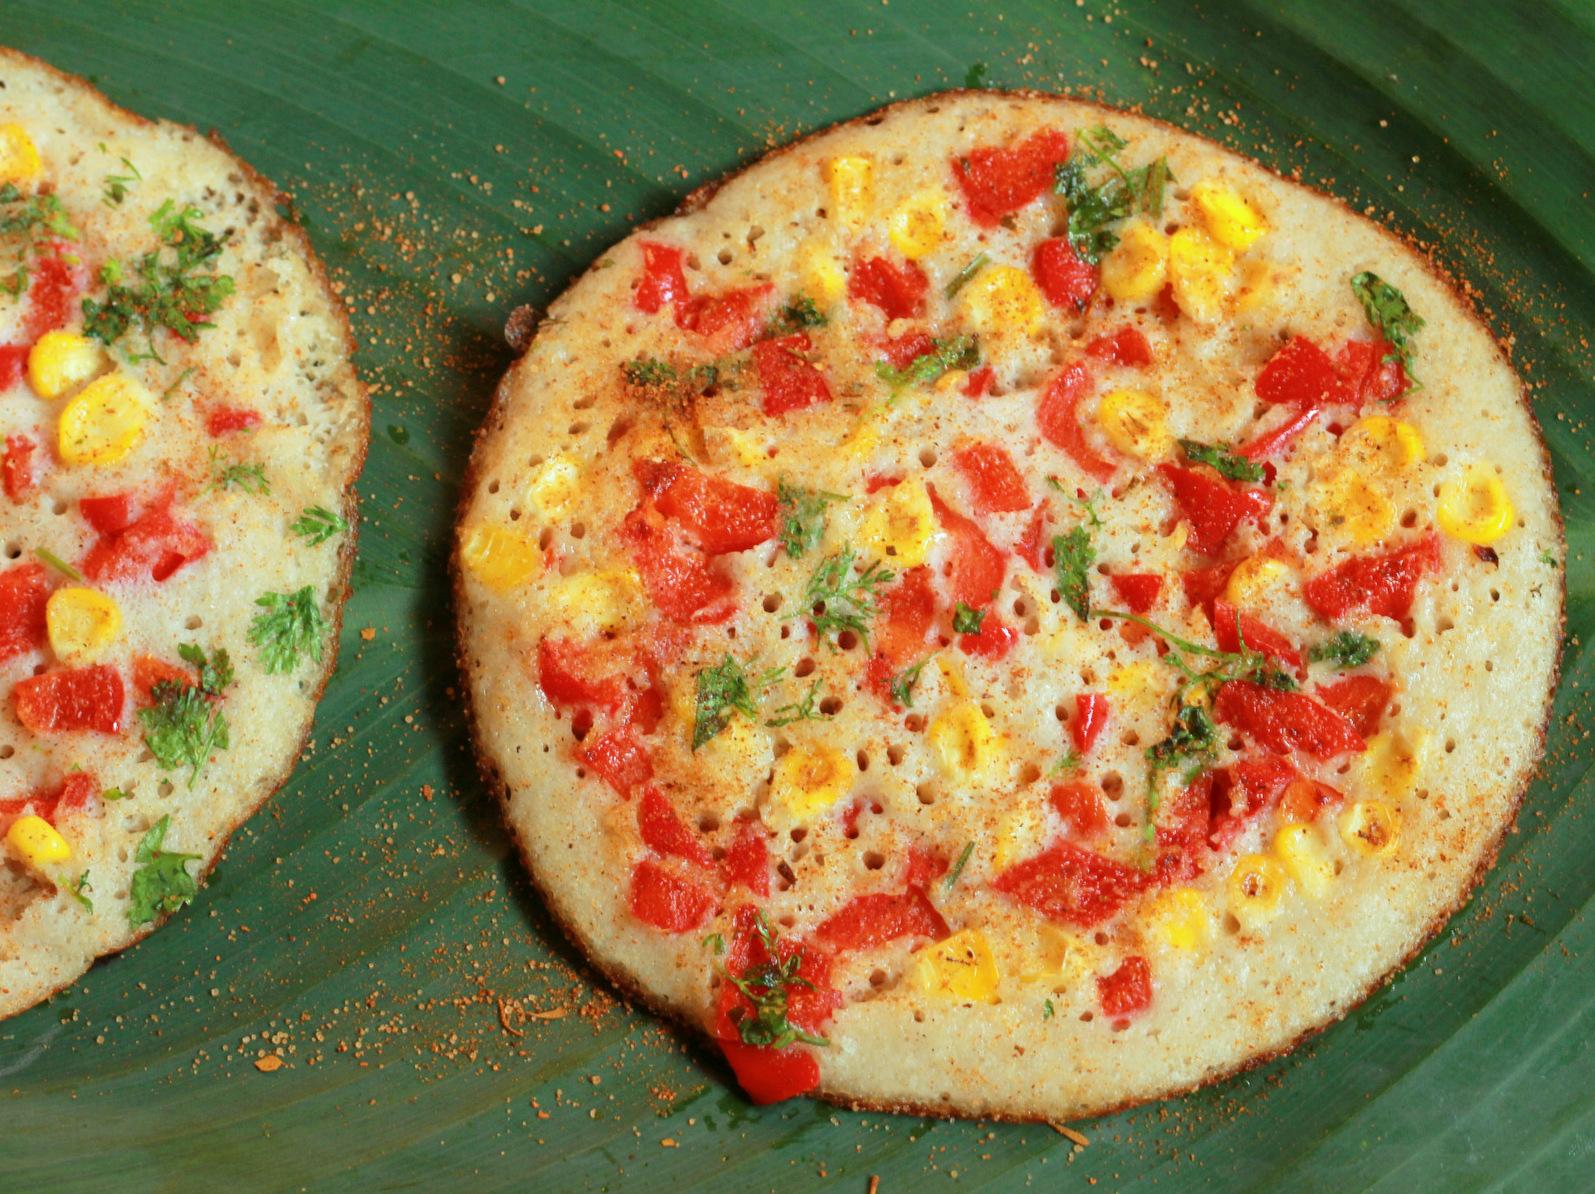 Maharashtrian vegetable amboli recipe savory lentil pancake topped maharashtrian vegetable amboli recipe savory lentil pancake topped with vegetables forumfinder Image collections